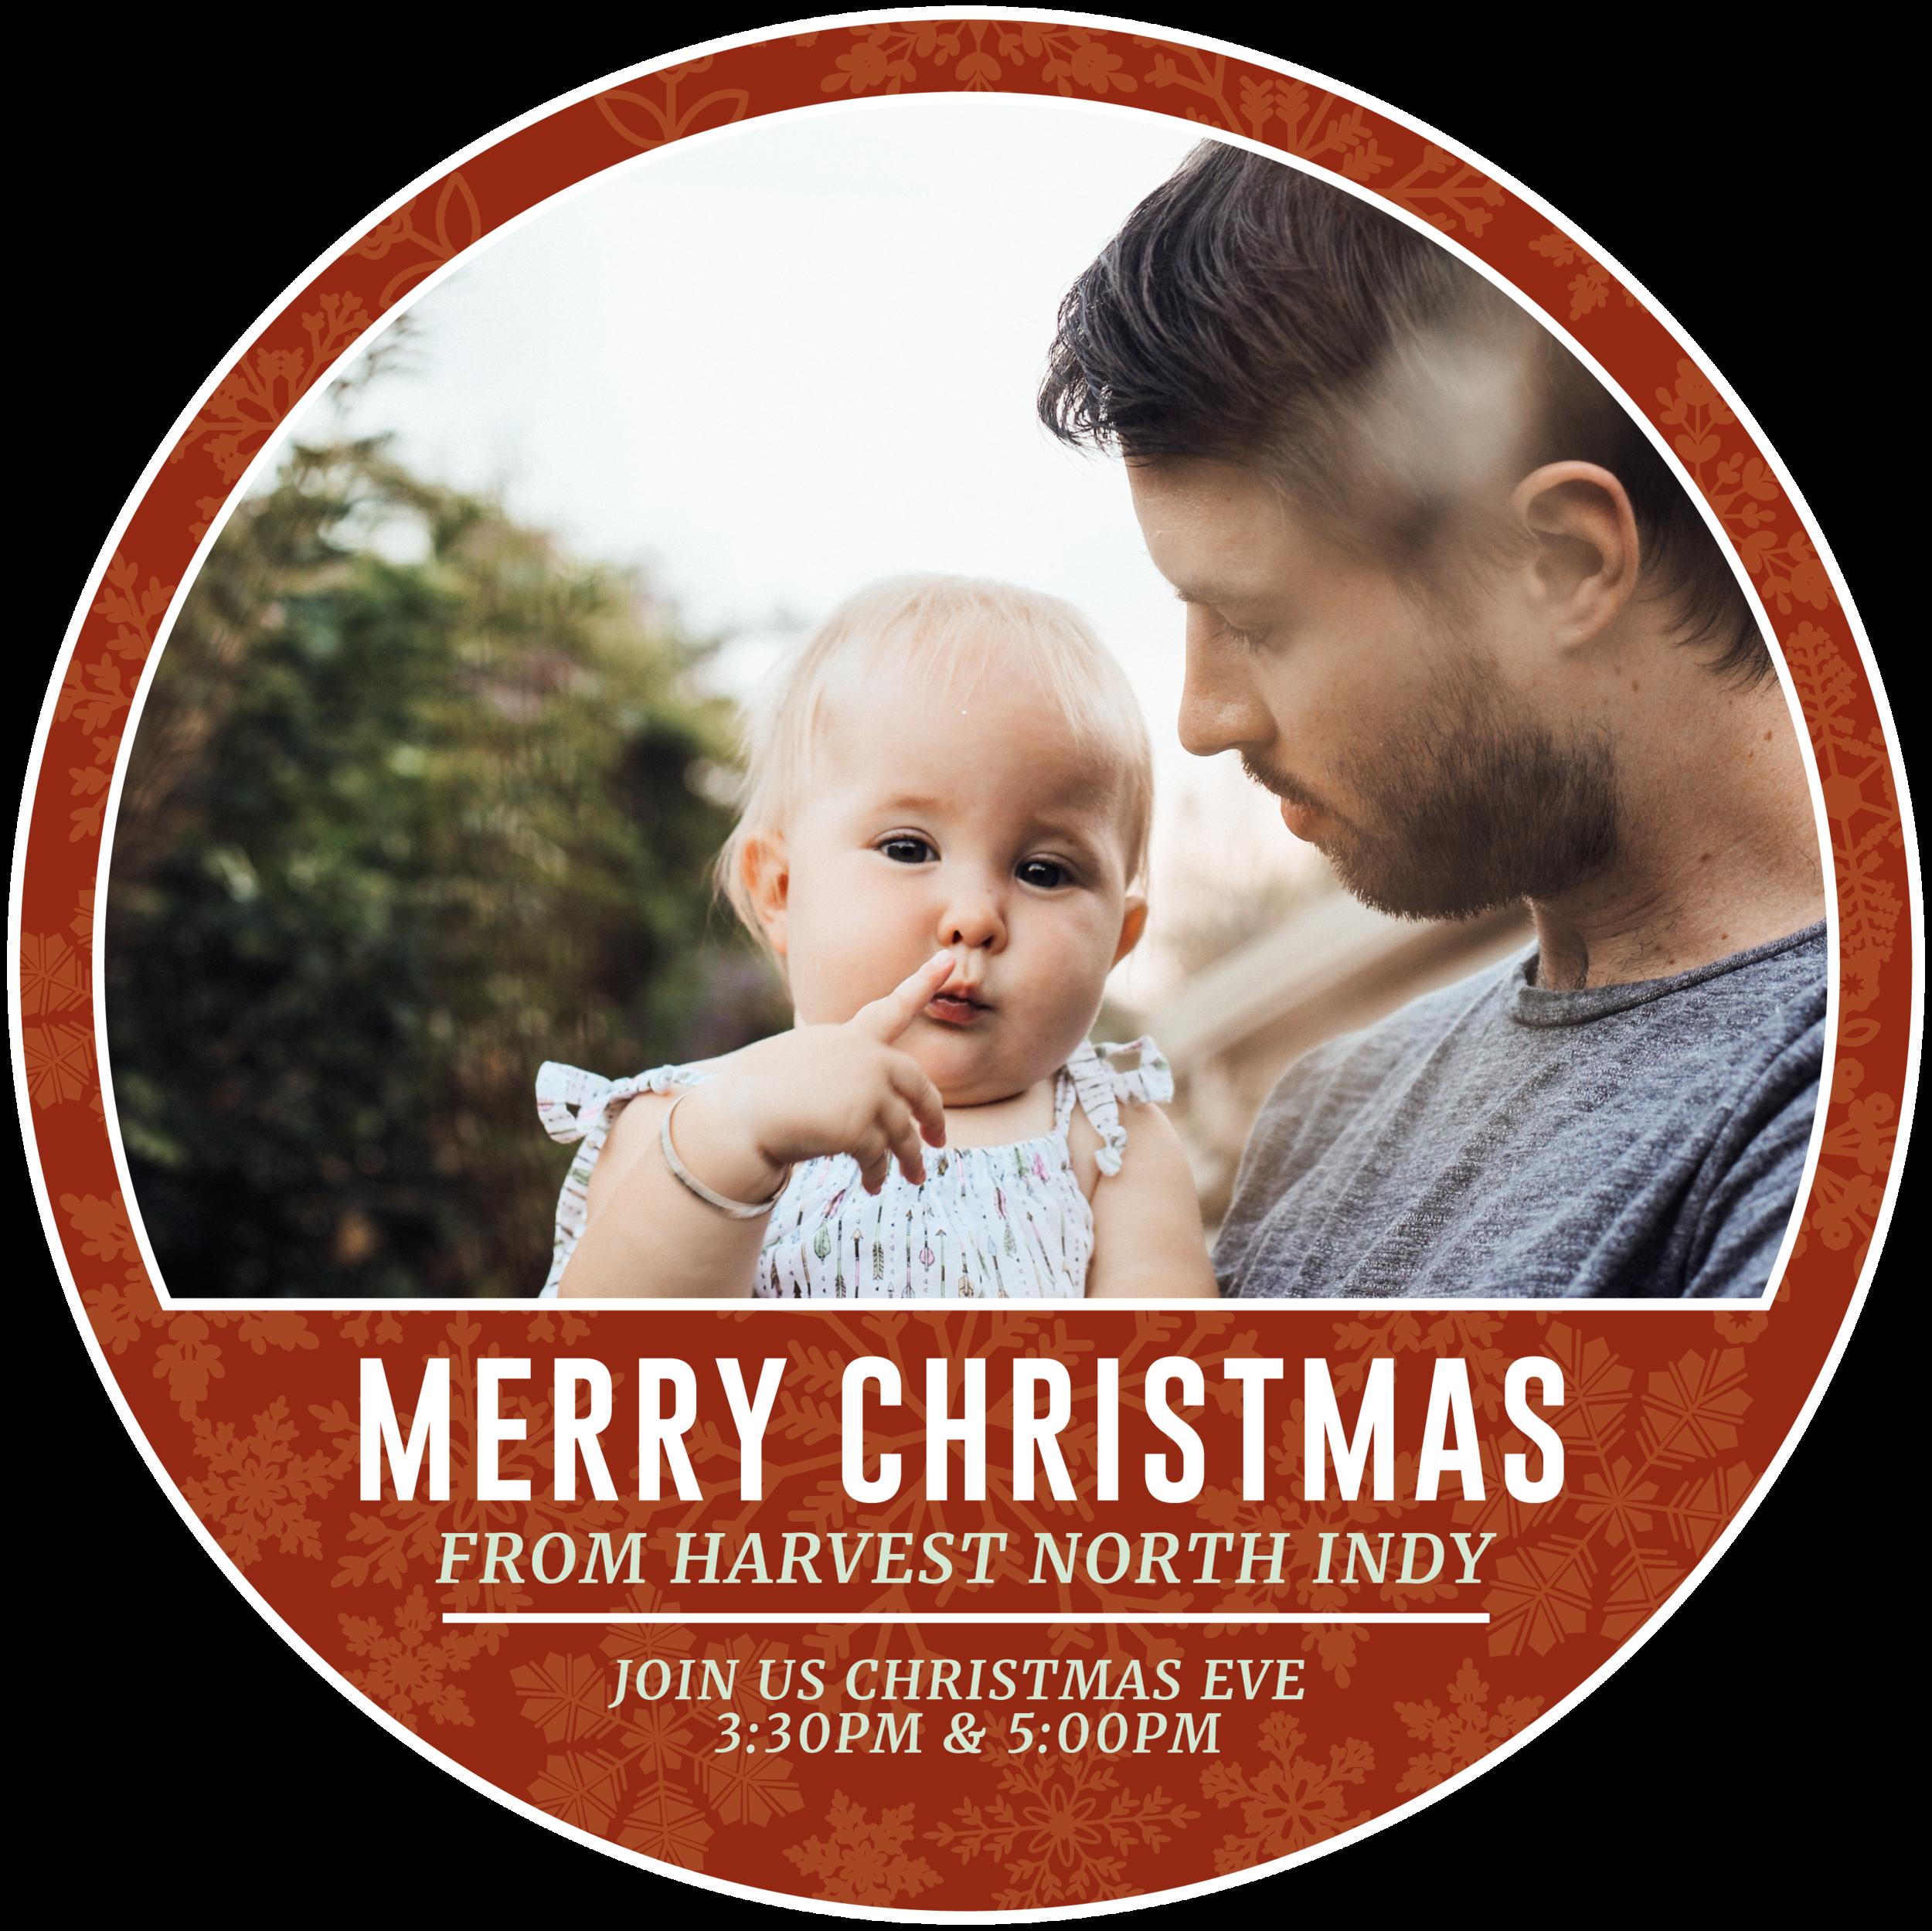 Christmas-Facebook Frame-02.png